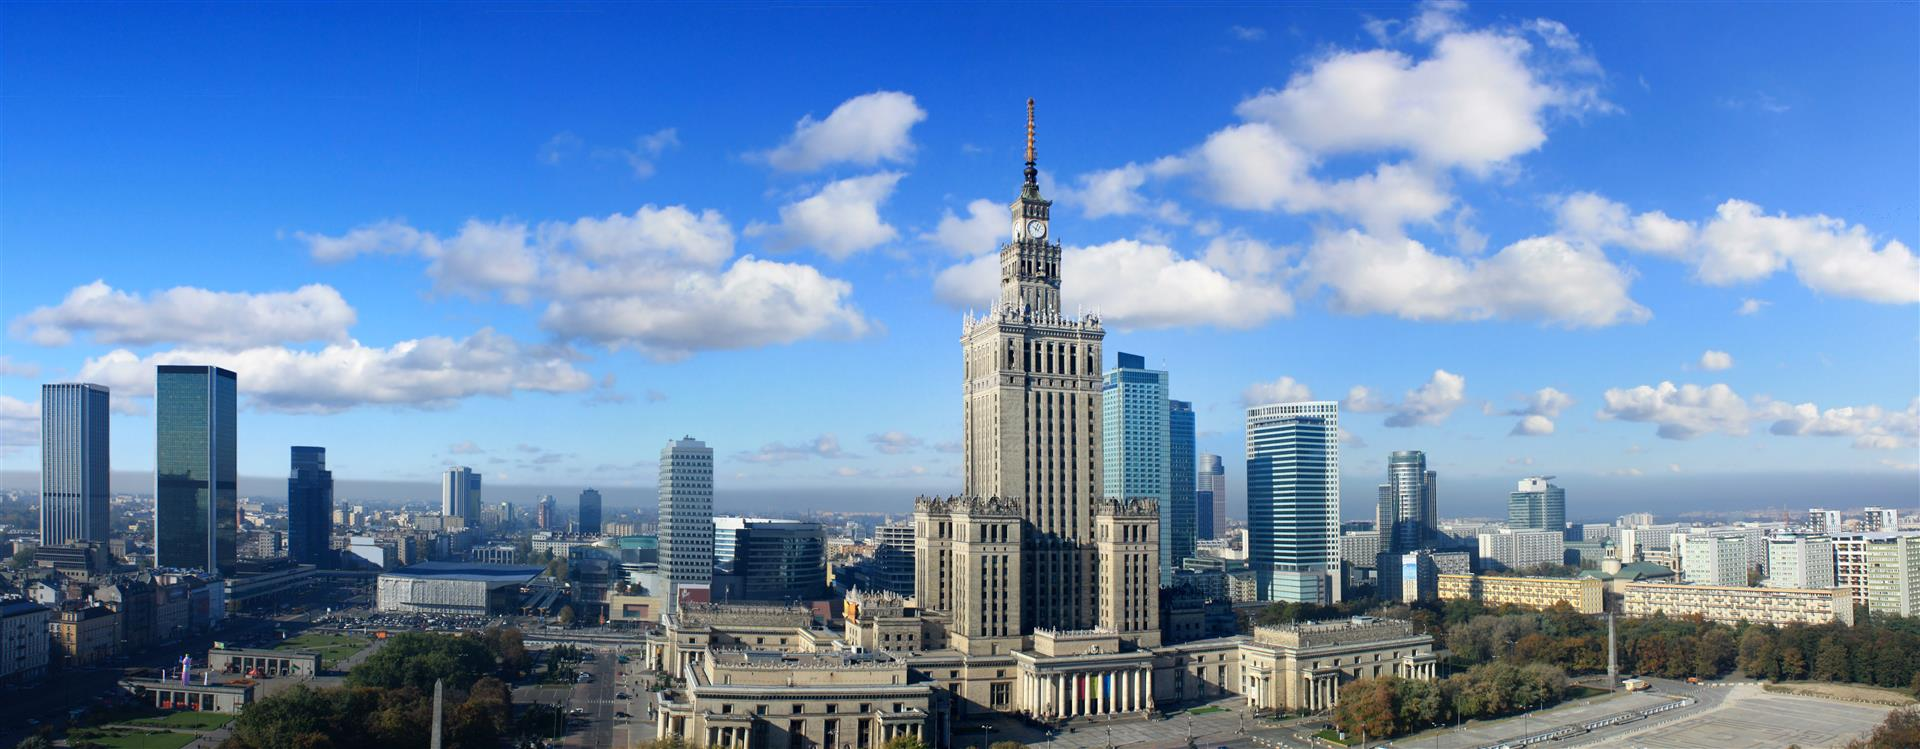 Warszawa_2_Panorama